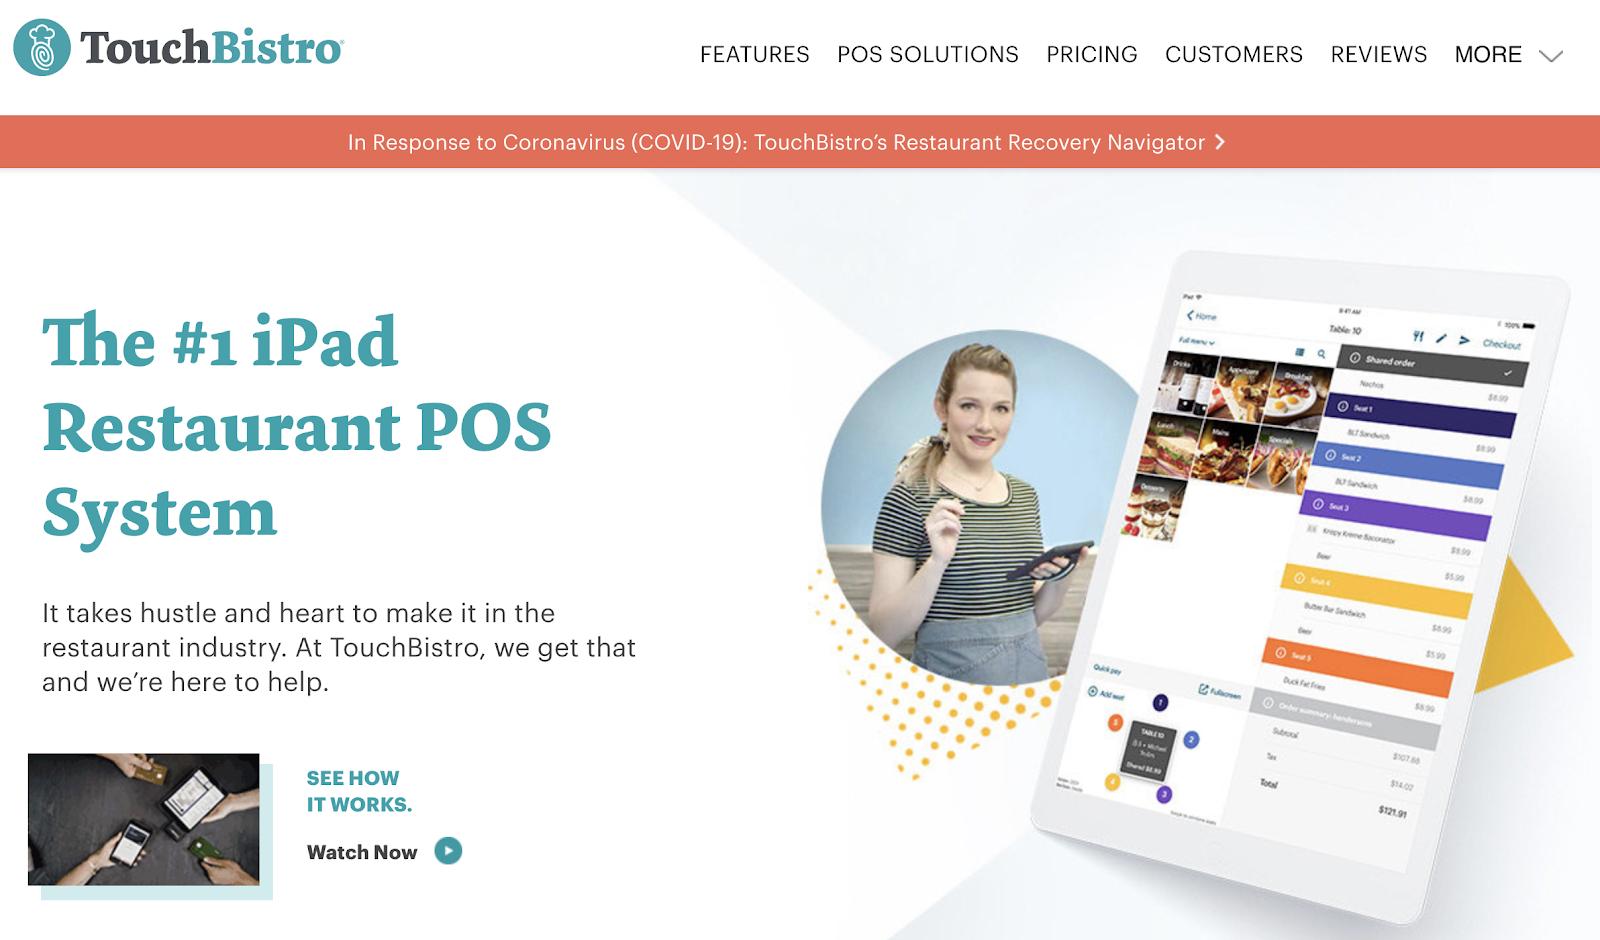 SaaS marketing case study with TouchBistro